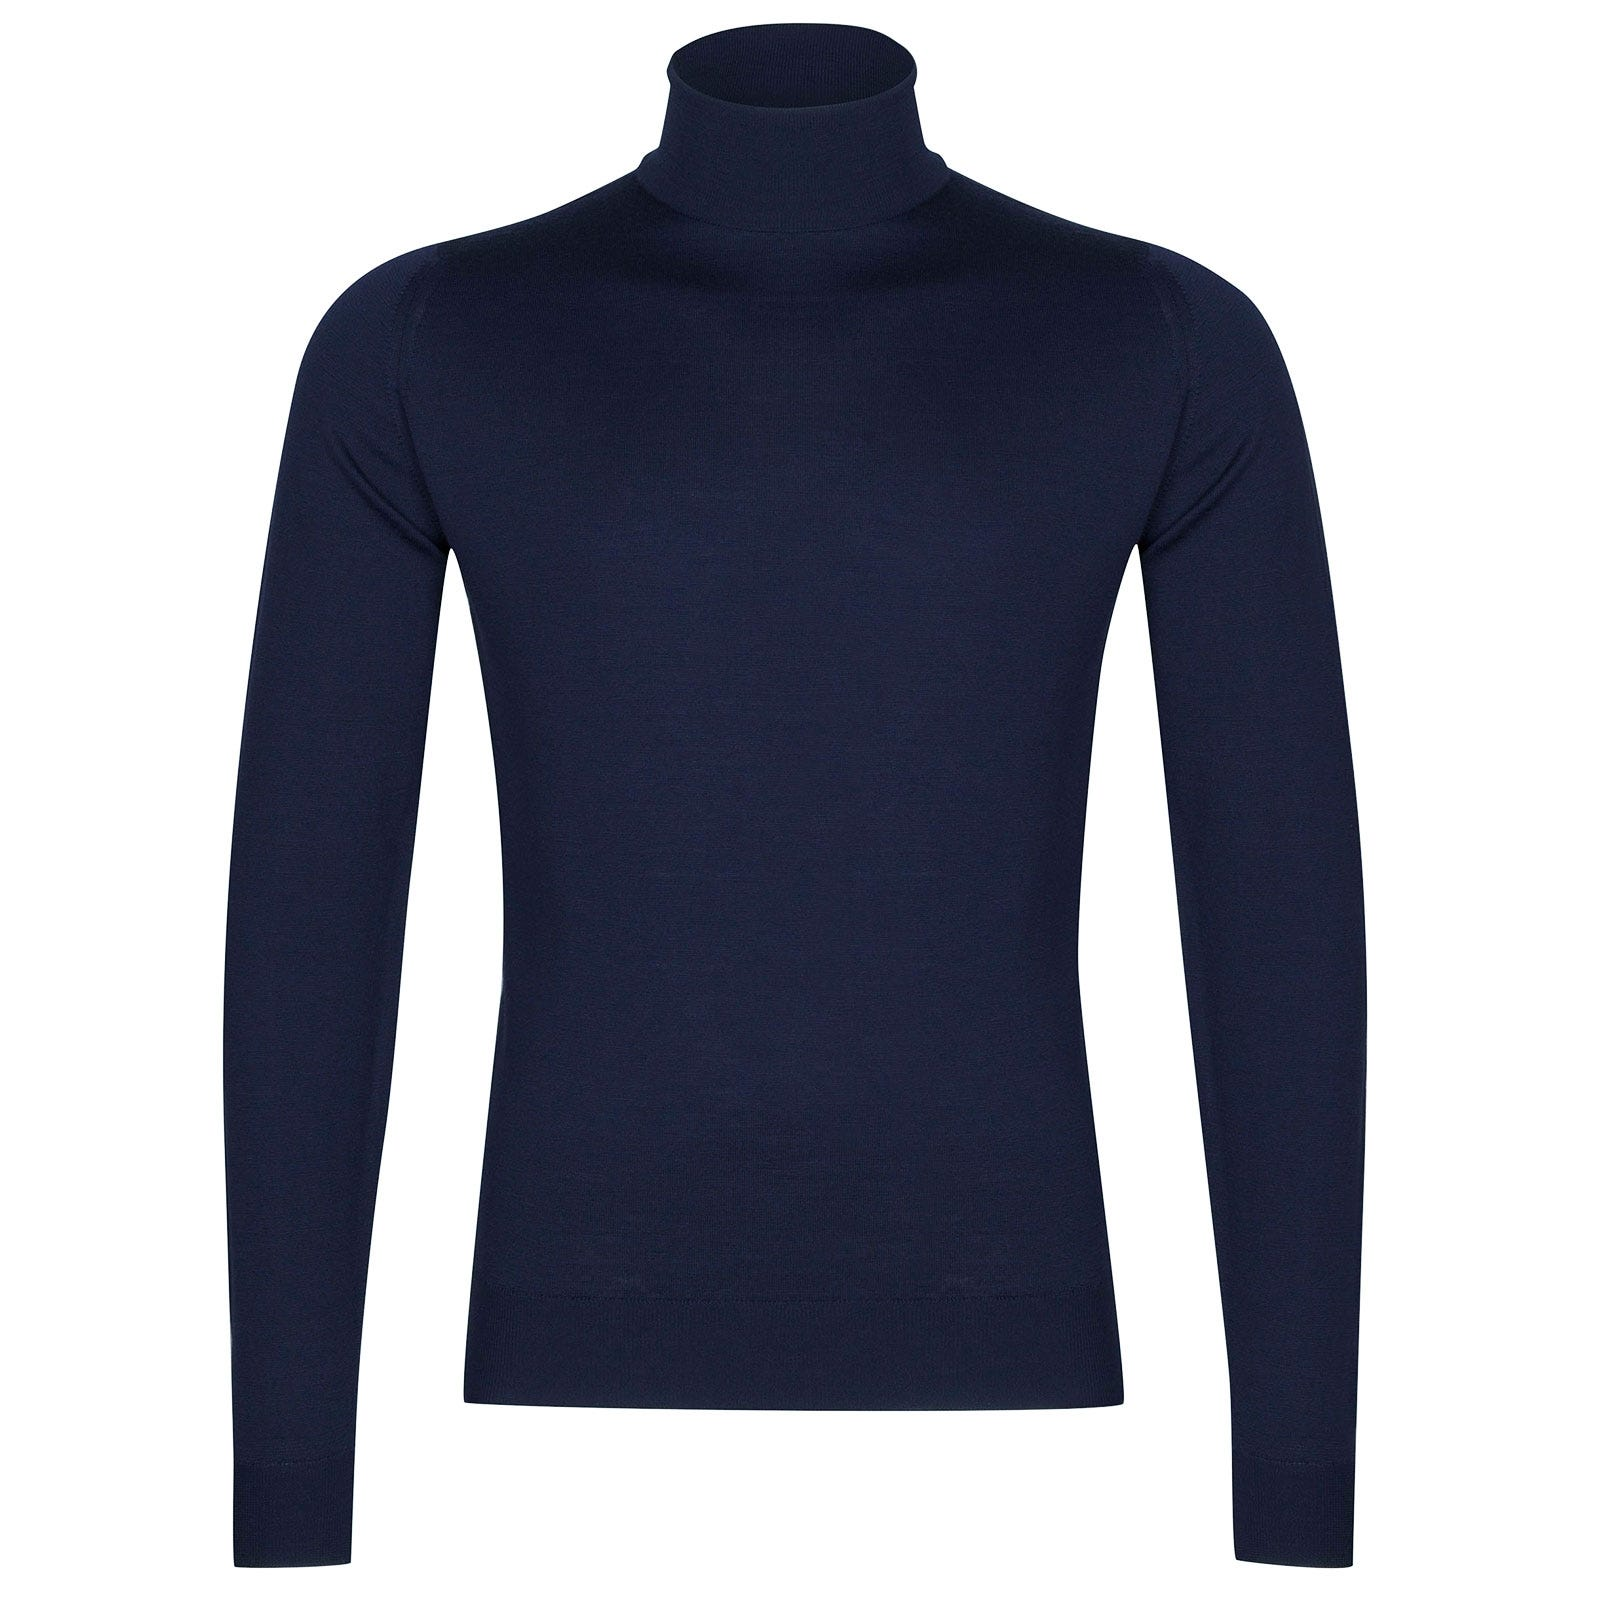 John Smedley Cherwell Merino Wool Pullover in Magnetic Cobalt-XL